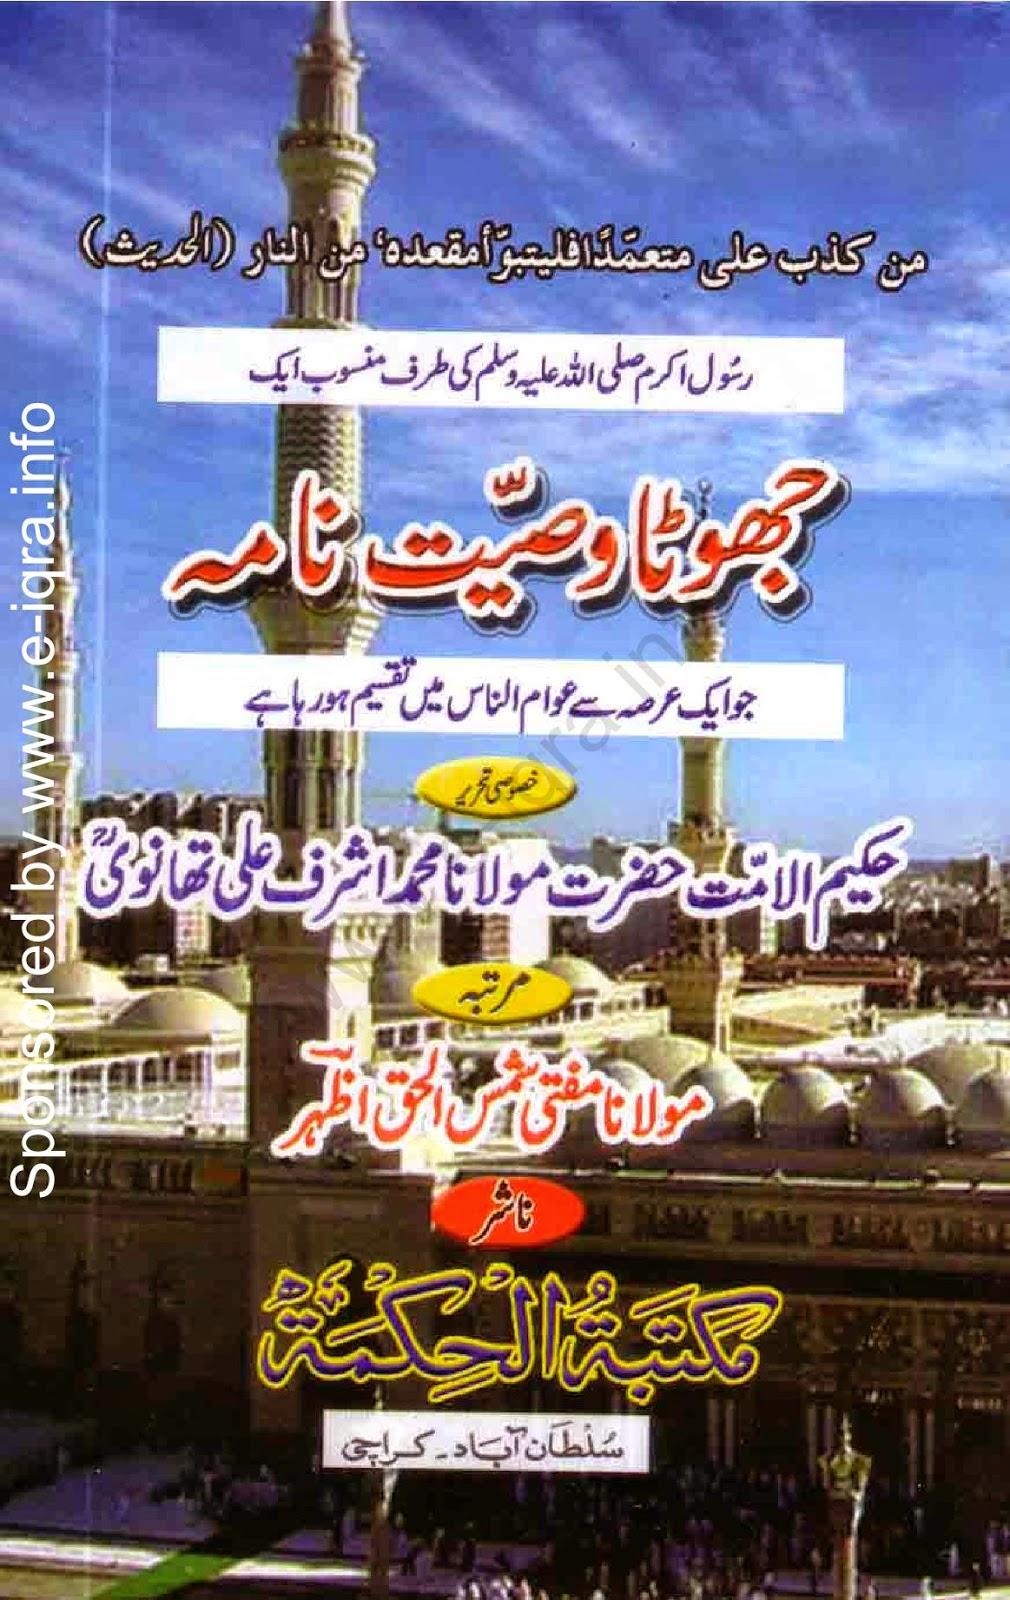 http://www.mediafire.com/view/c8hlmcqy86iydnv/Jhota_Wasiat_Nama_(freepdfpost.blogspot.com.pdf